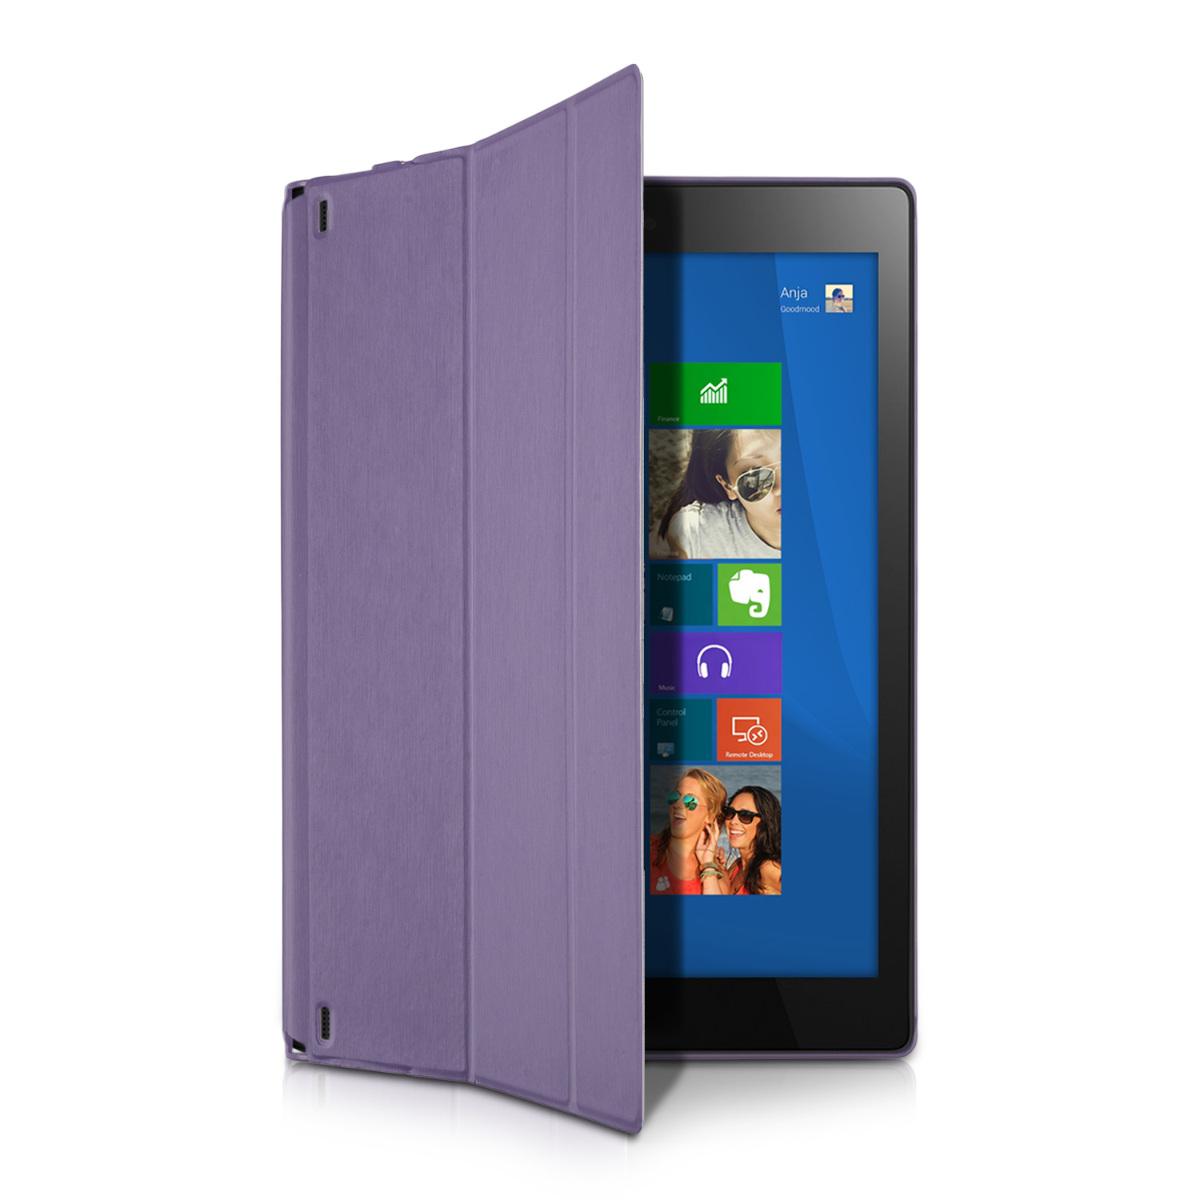 Funda para lenovo yoga tablet 2 10 1050 violeta carcasa - Funda protectora tablet ...